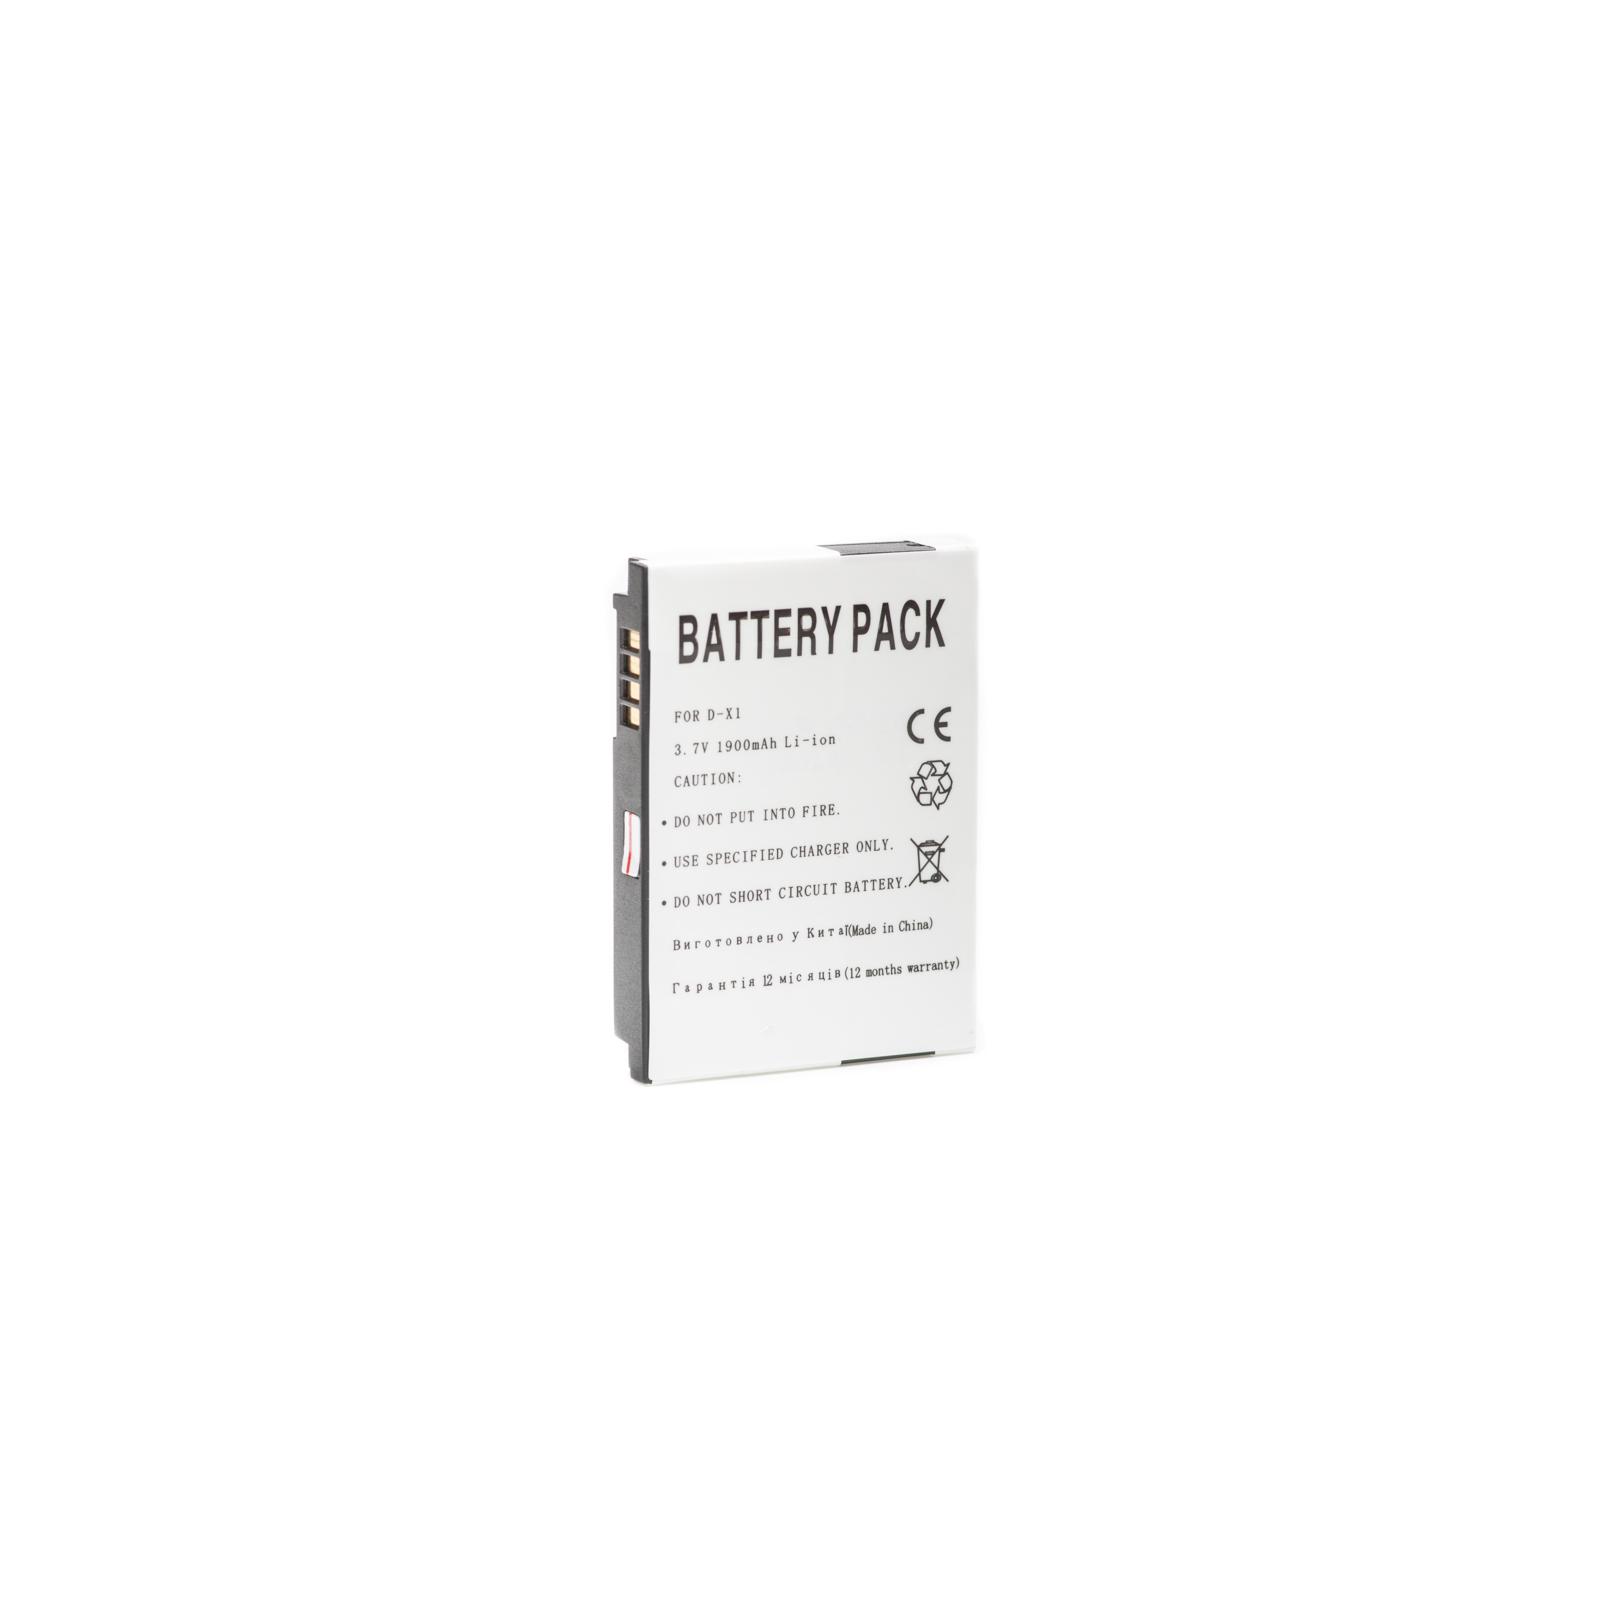 Аккумуляторная батарея PowerPlant Blackberry D-X1 (DV00DV6066) изображение 2